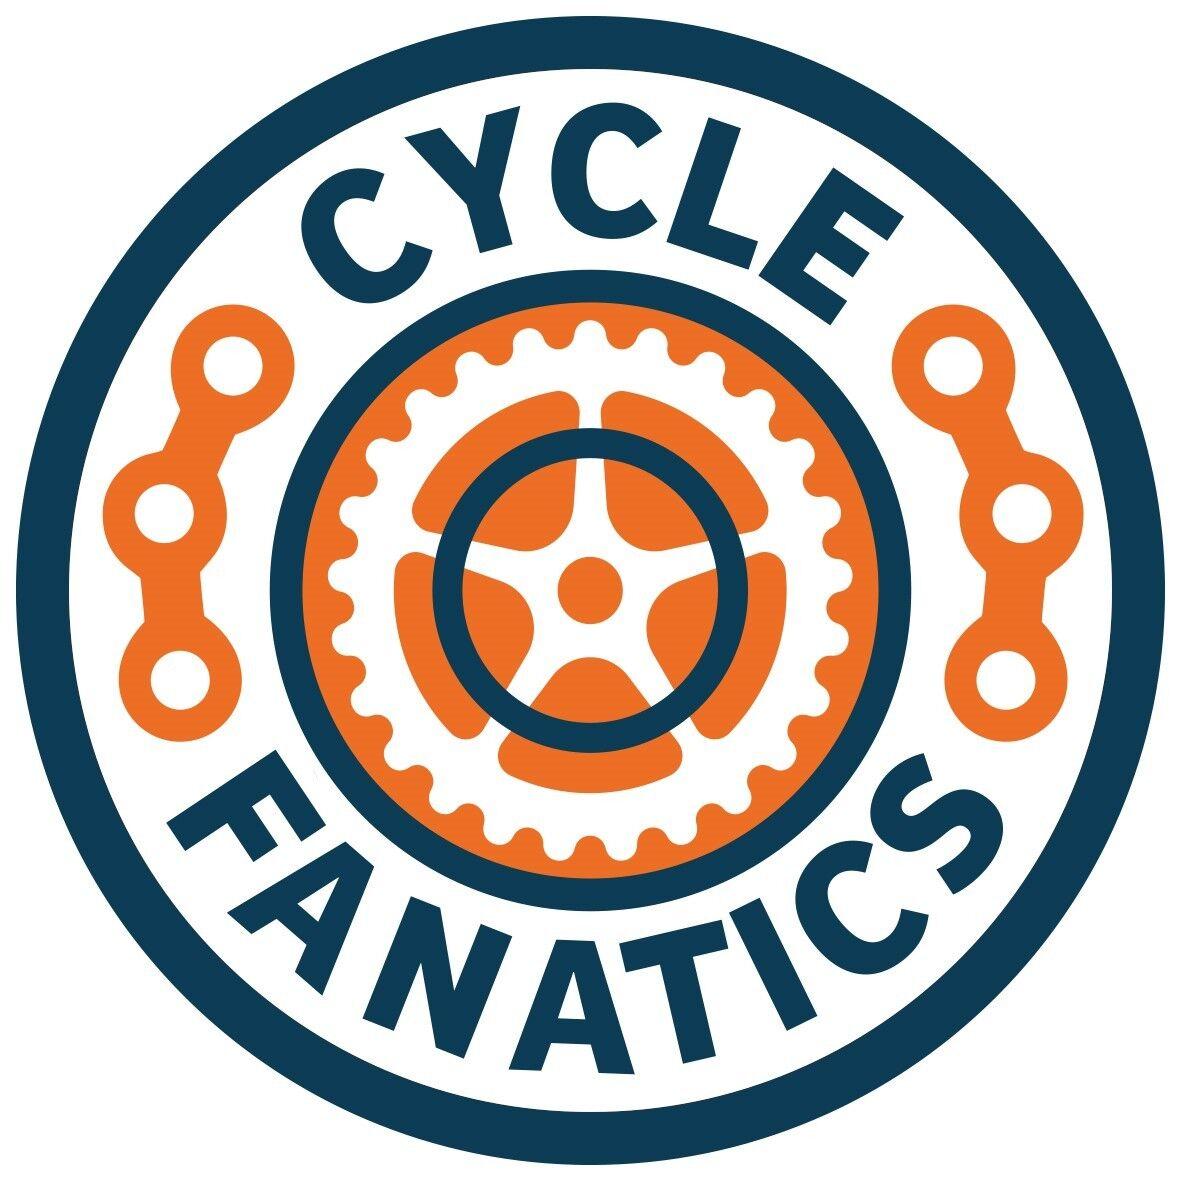 thecyclefanatics